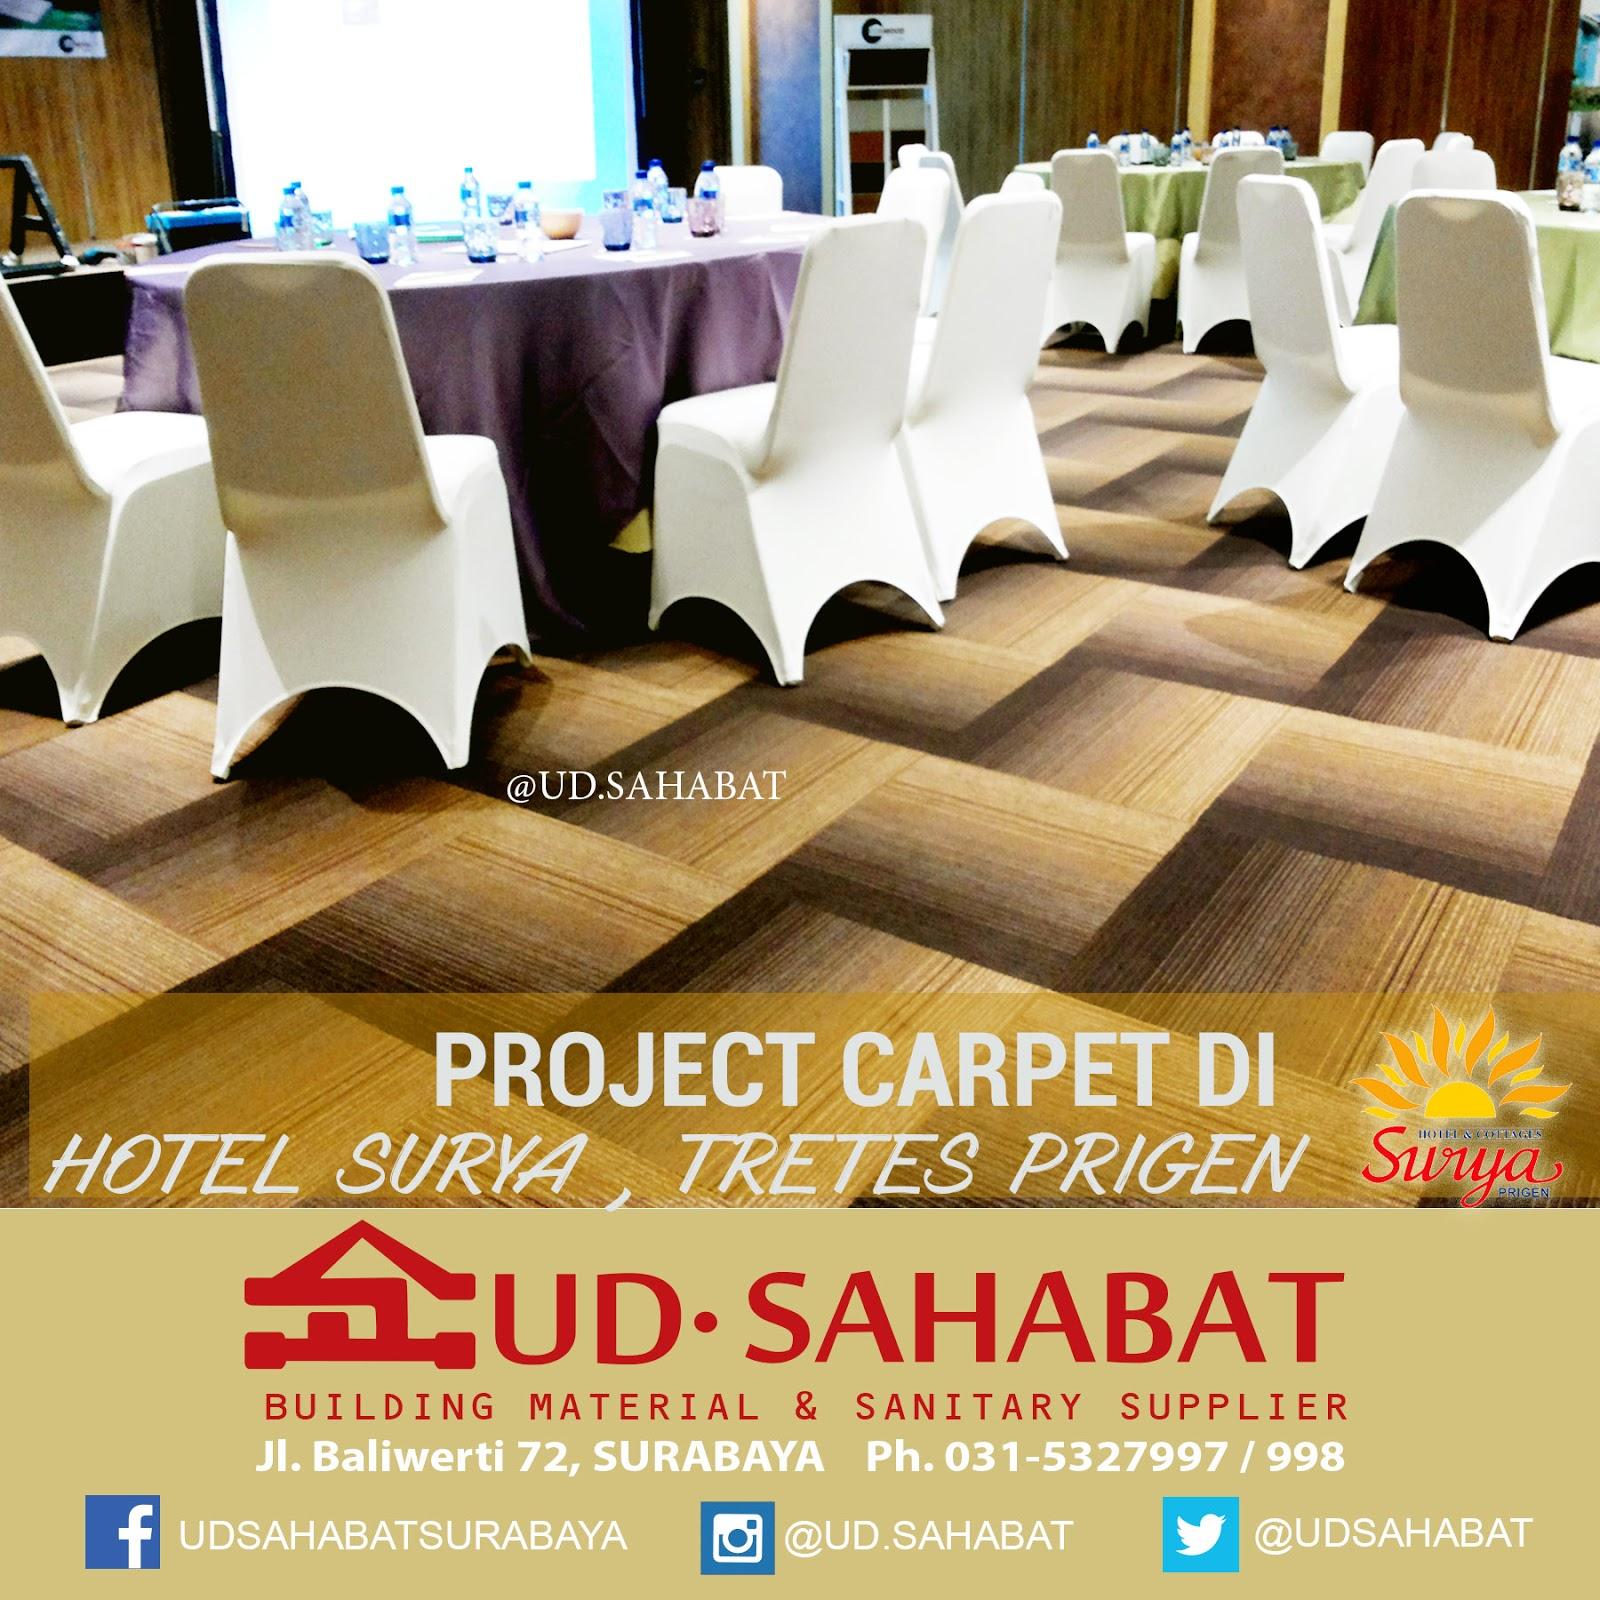 carpet tile surabaya murah ud sahabat baliwerti 72